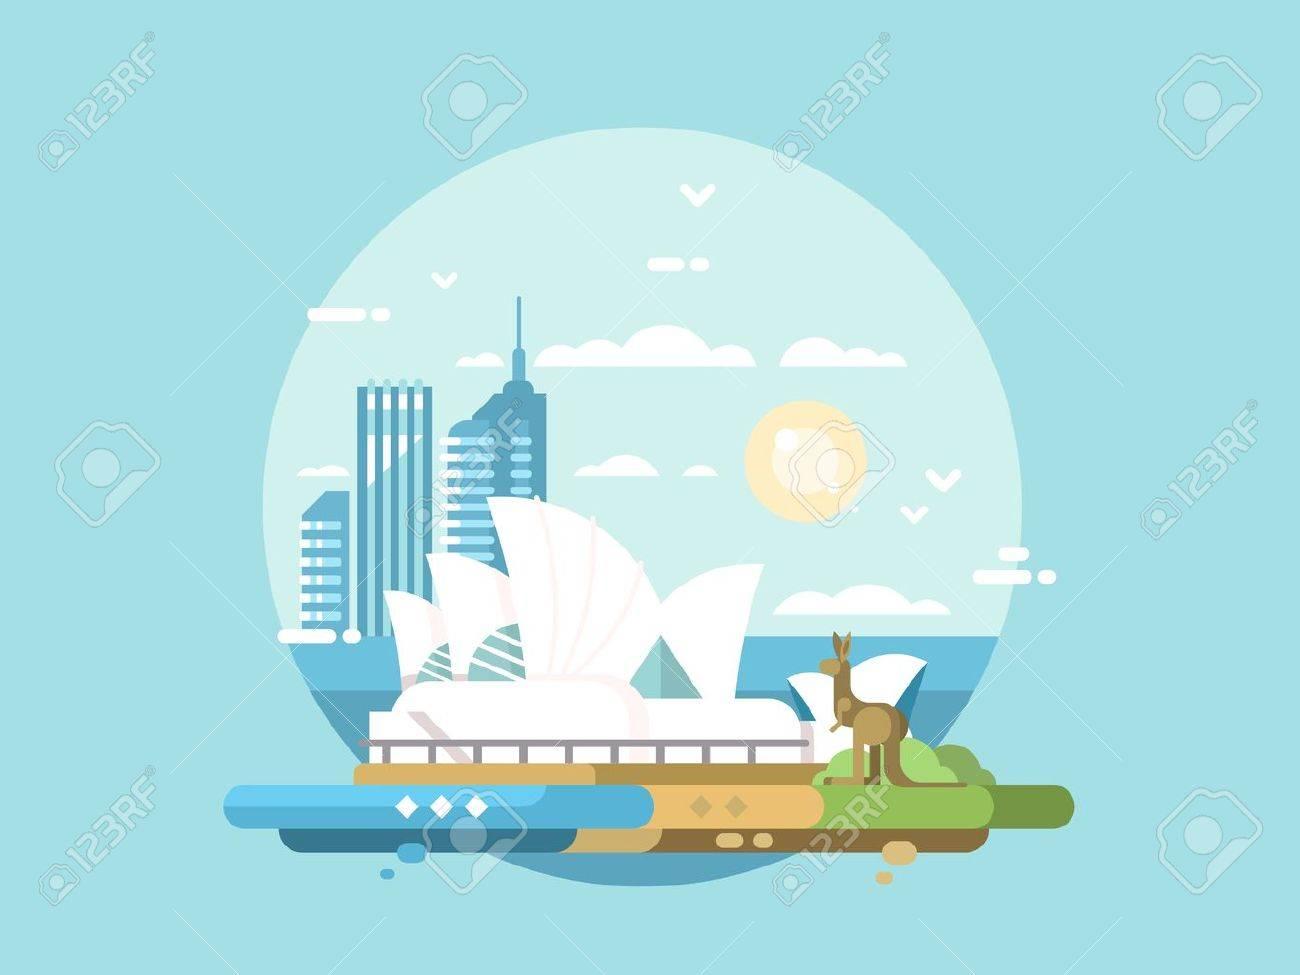 Sydney city flat design. Modern opera house and kangaroo. Vector illustration - 61668584